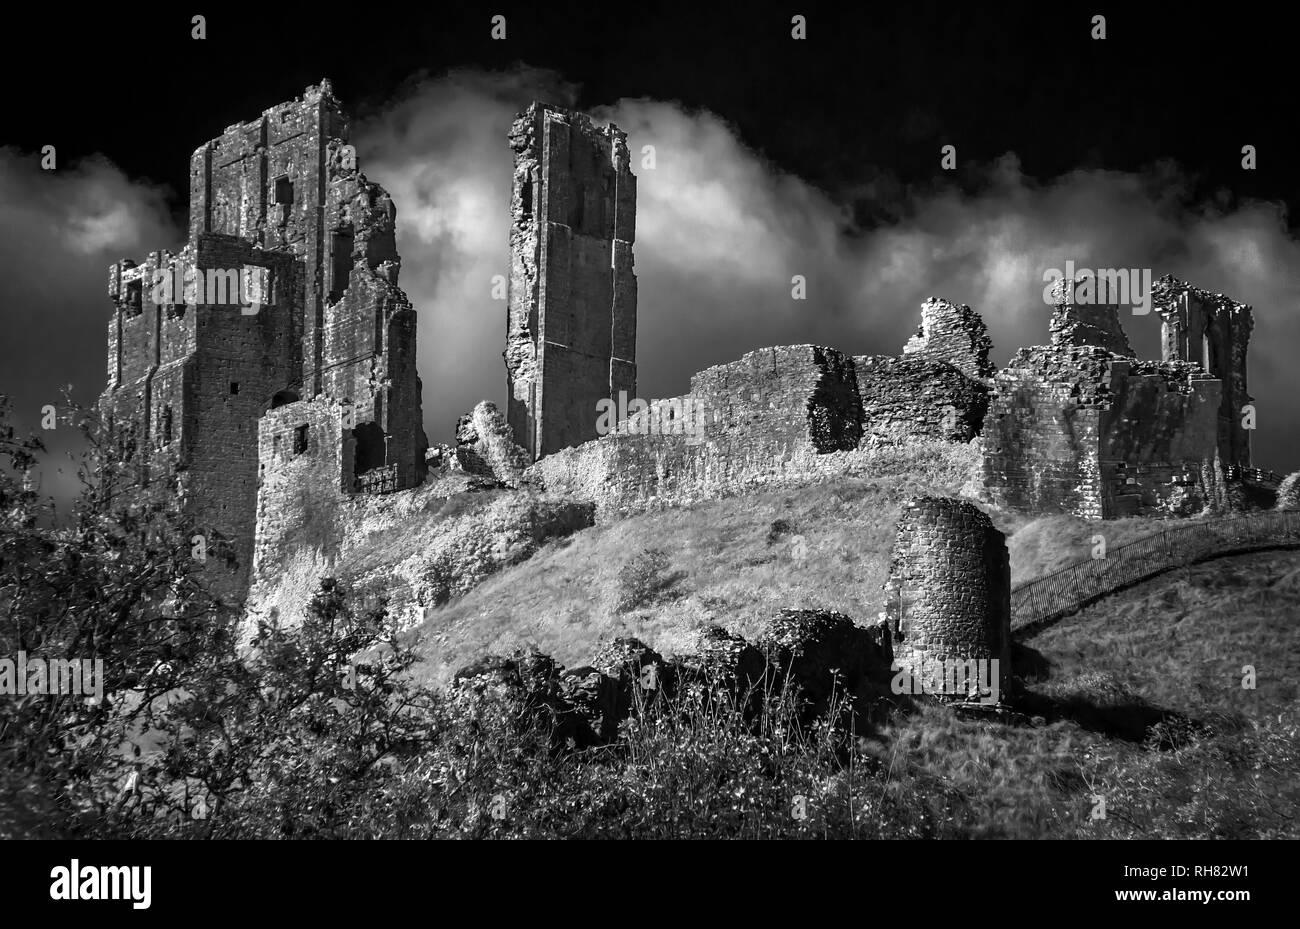 Imagen Monocromática Infrarroja de Corfe Castle en Dorset, Inglaterra Foto de stock